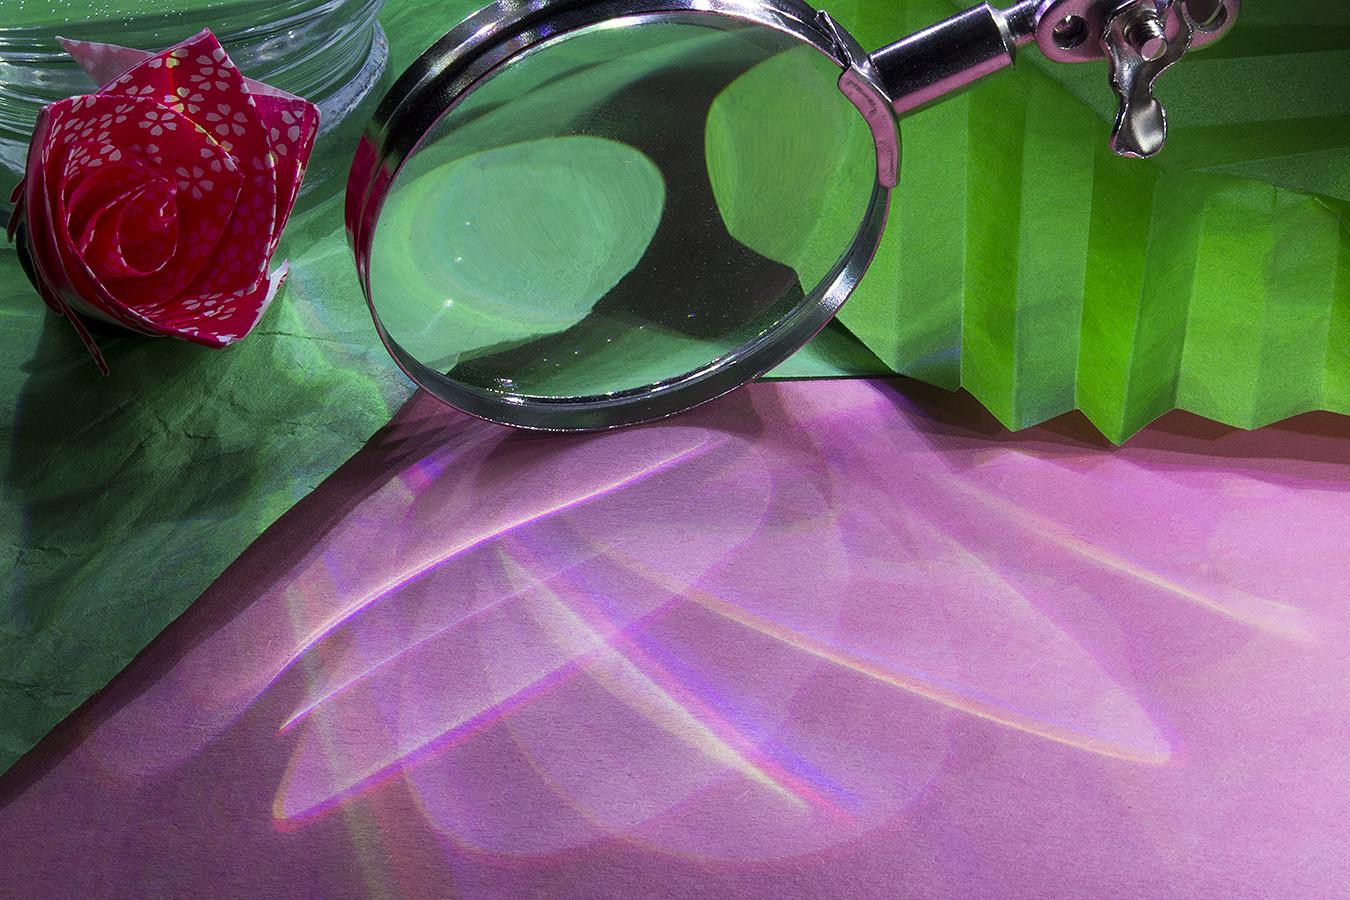 16_Flower_Jonathan_Tang_UPenn_Tony_Ward_Studio_Long_Exposure_Low_Light_LED_Optics_Origami_Paper_Rose_Leaf_Pink